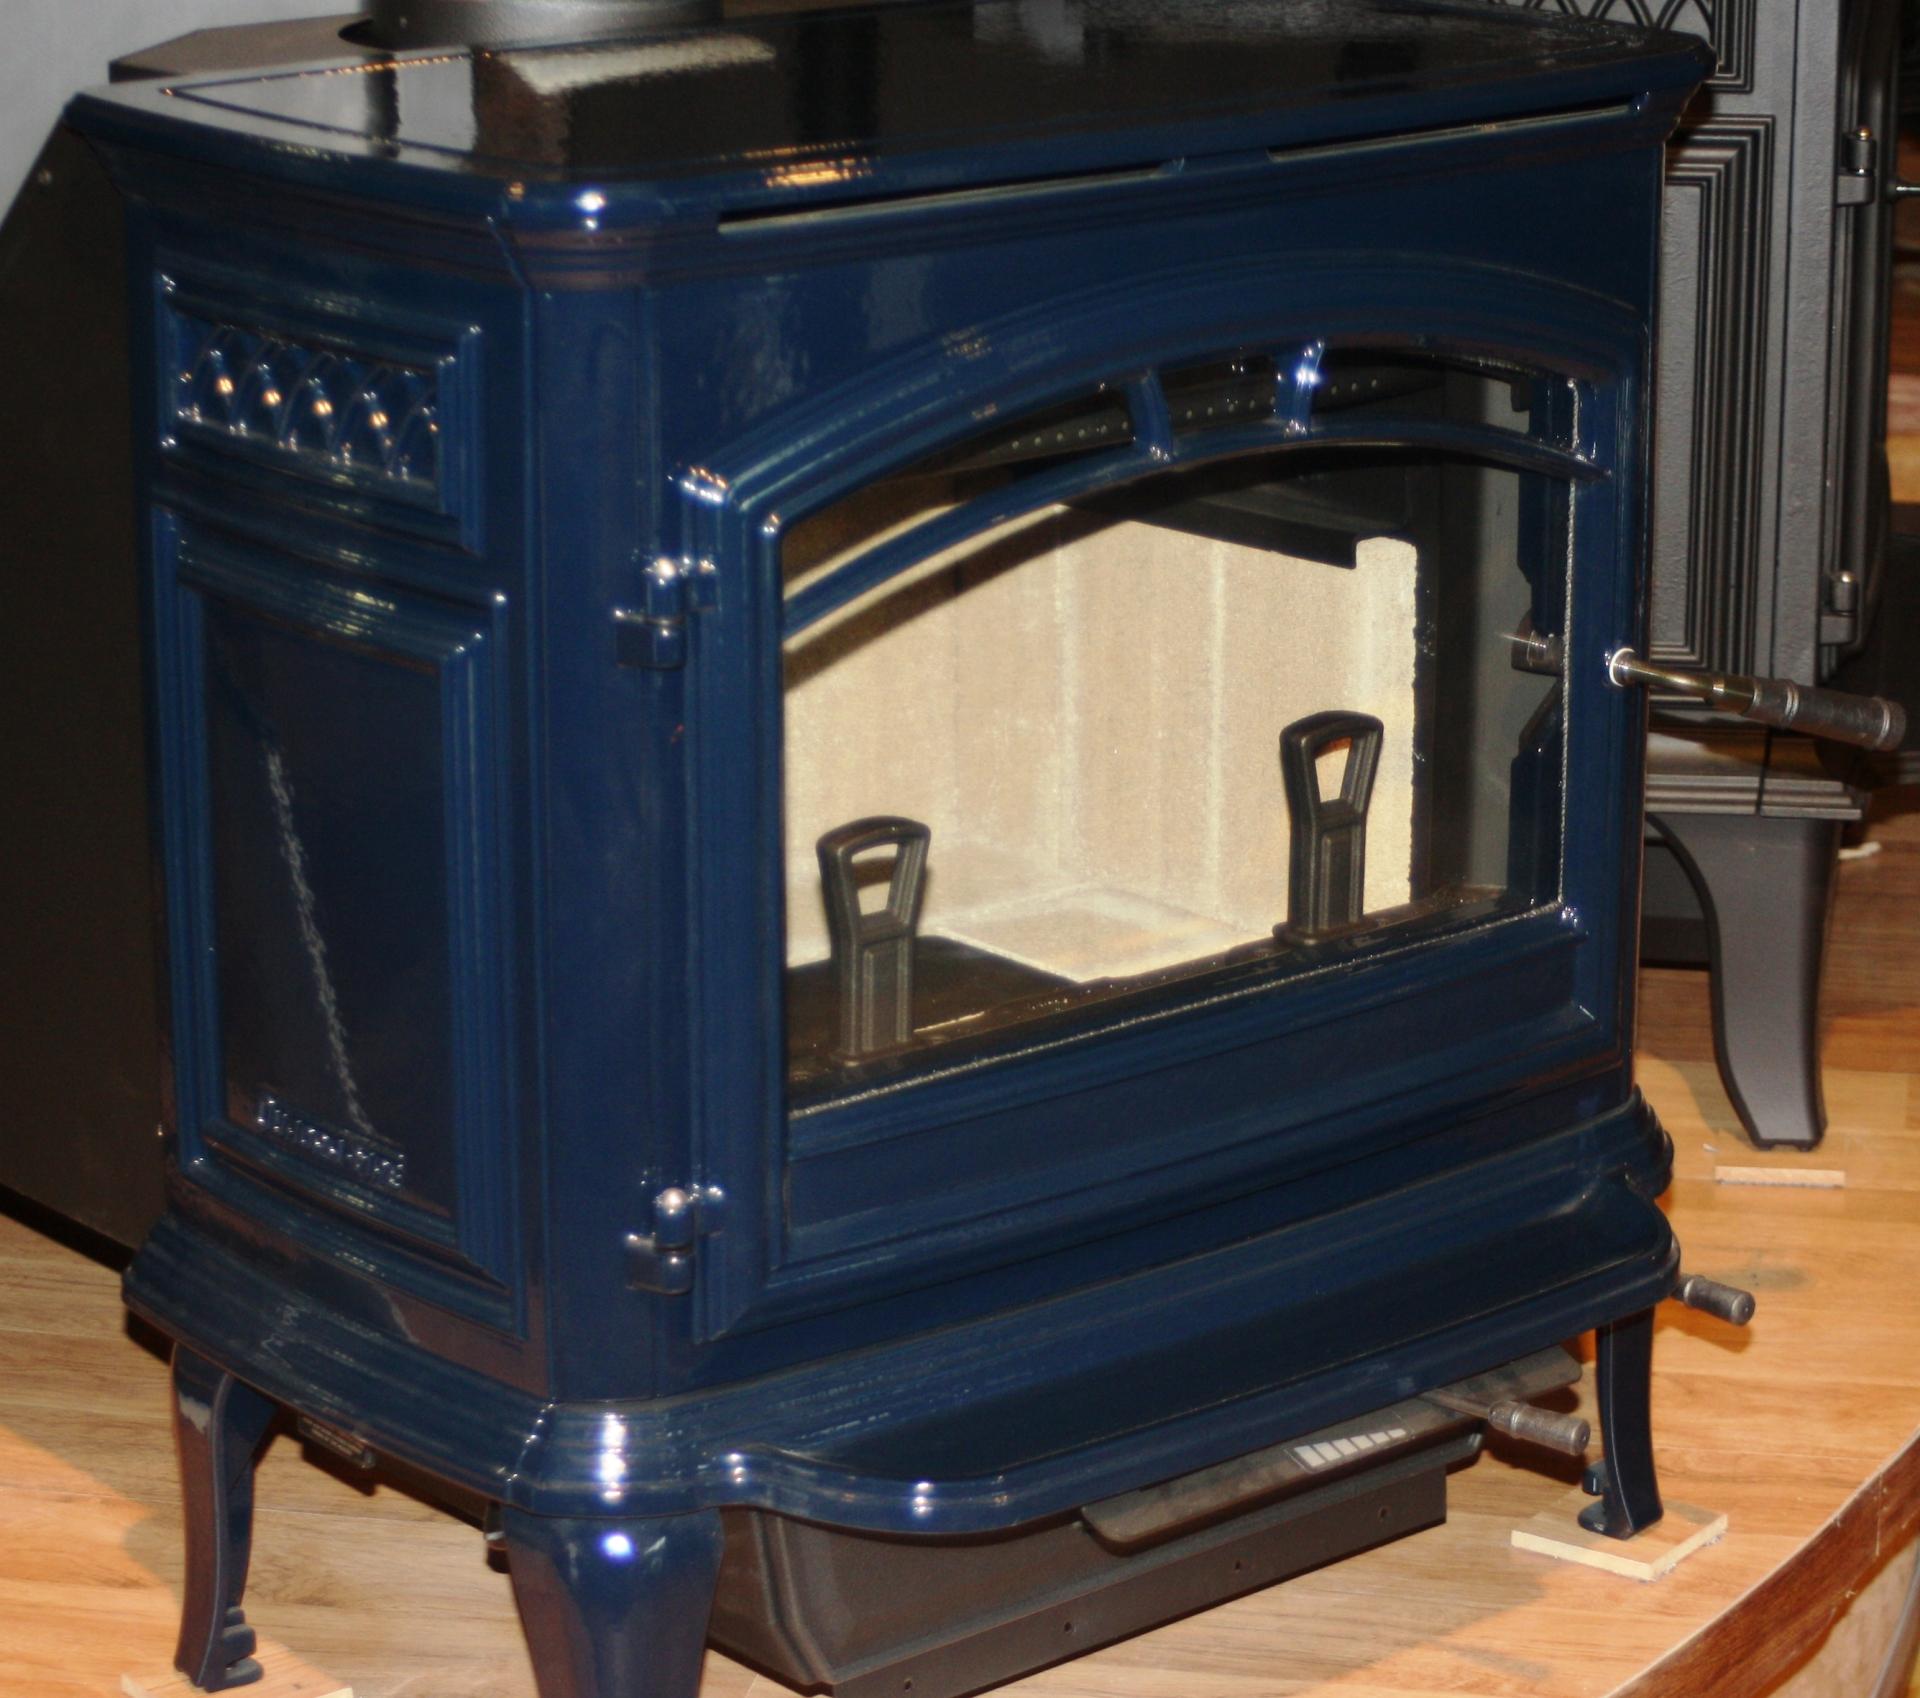 Quadra-Fire Explorer II Wood Stove, Blue Enamel